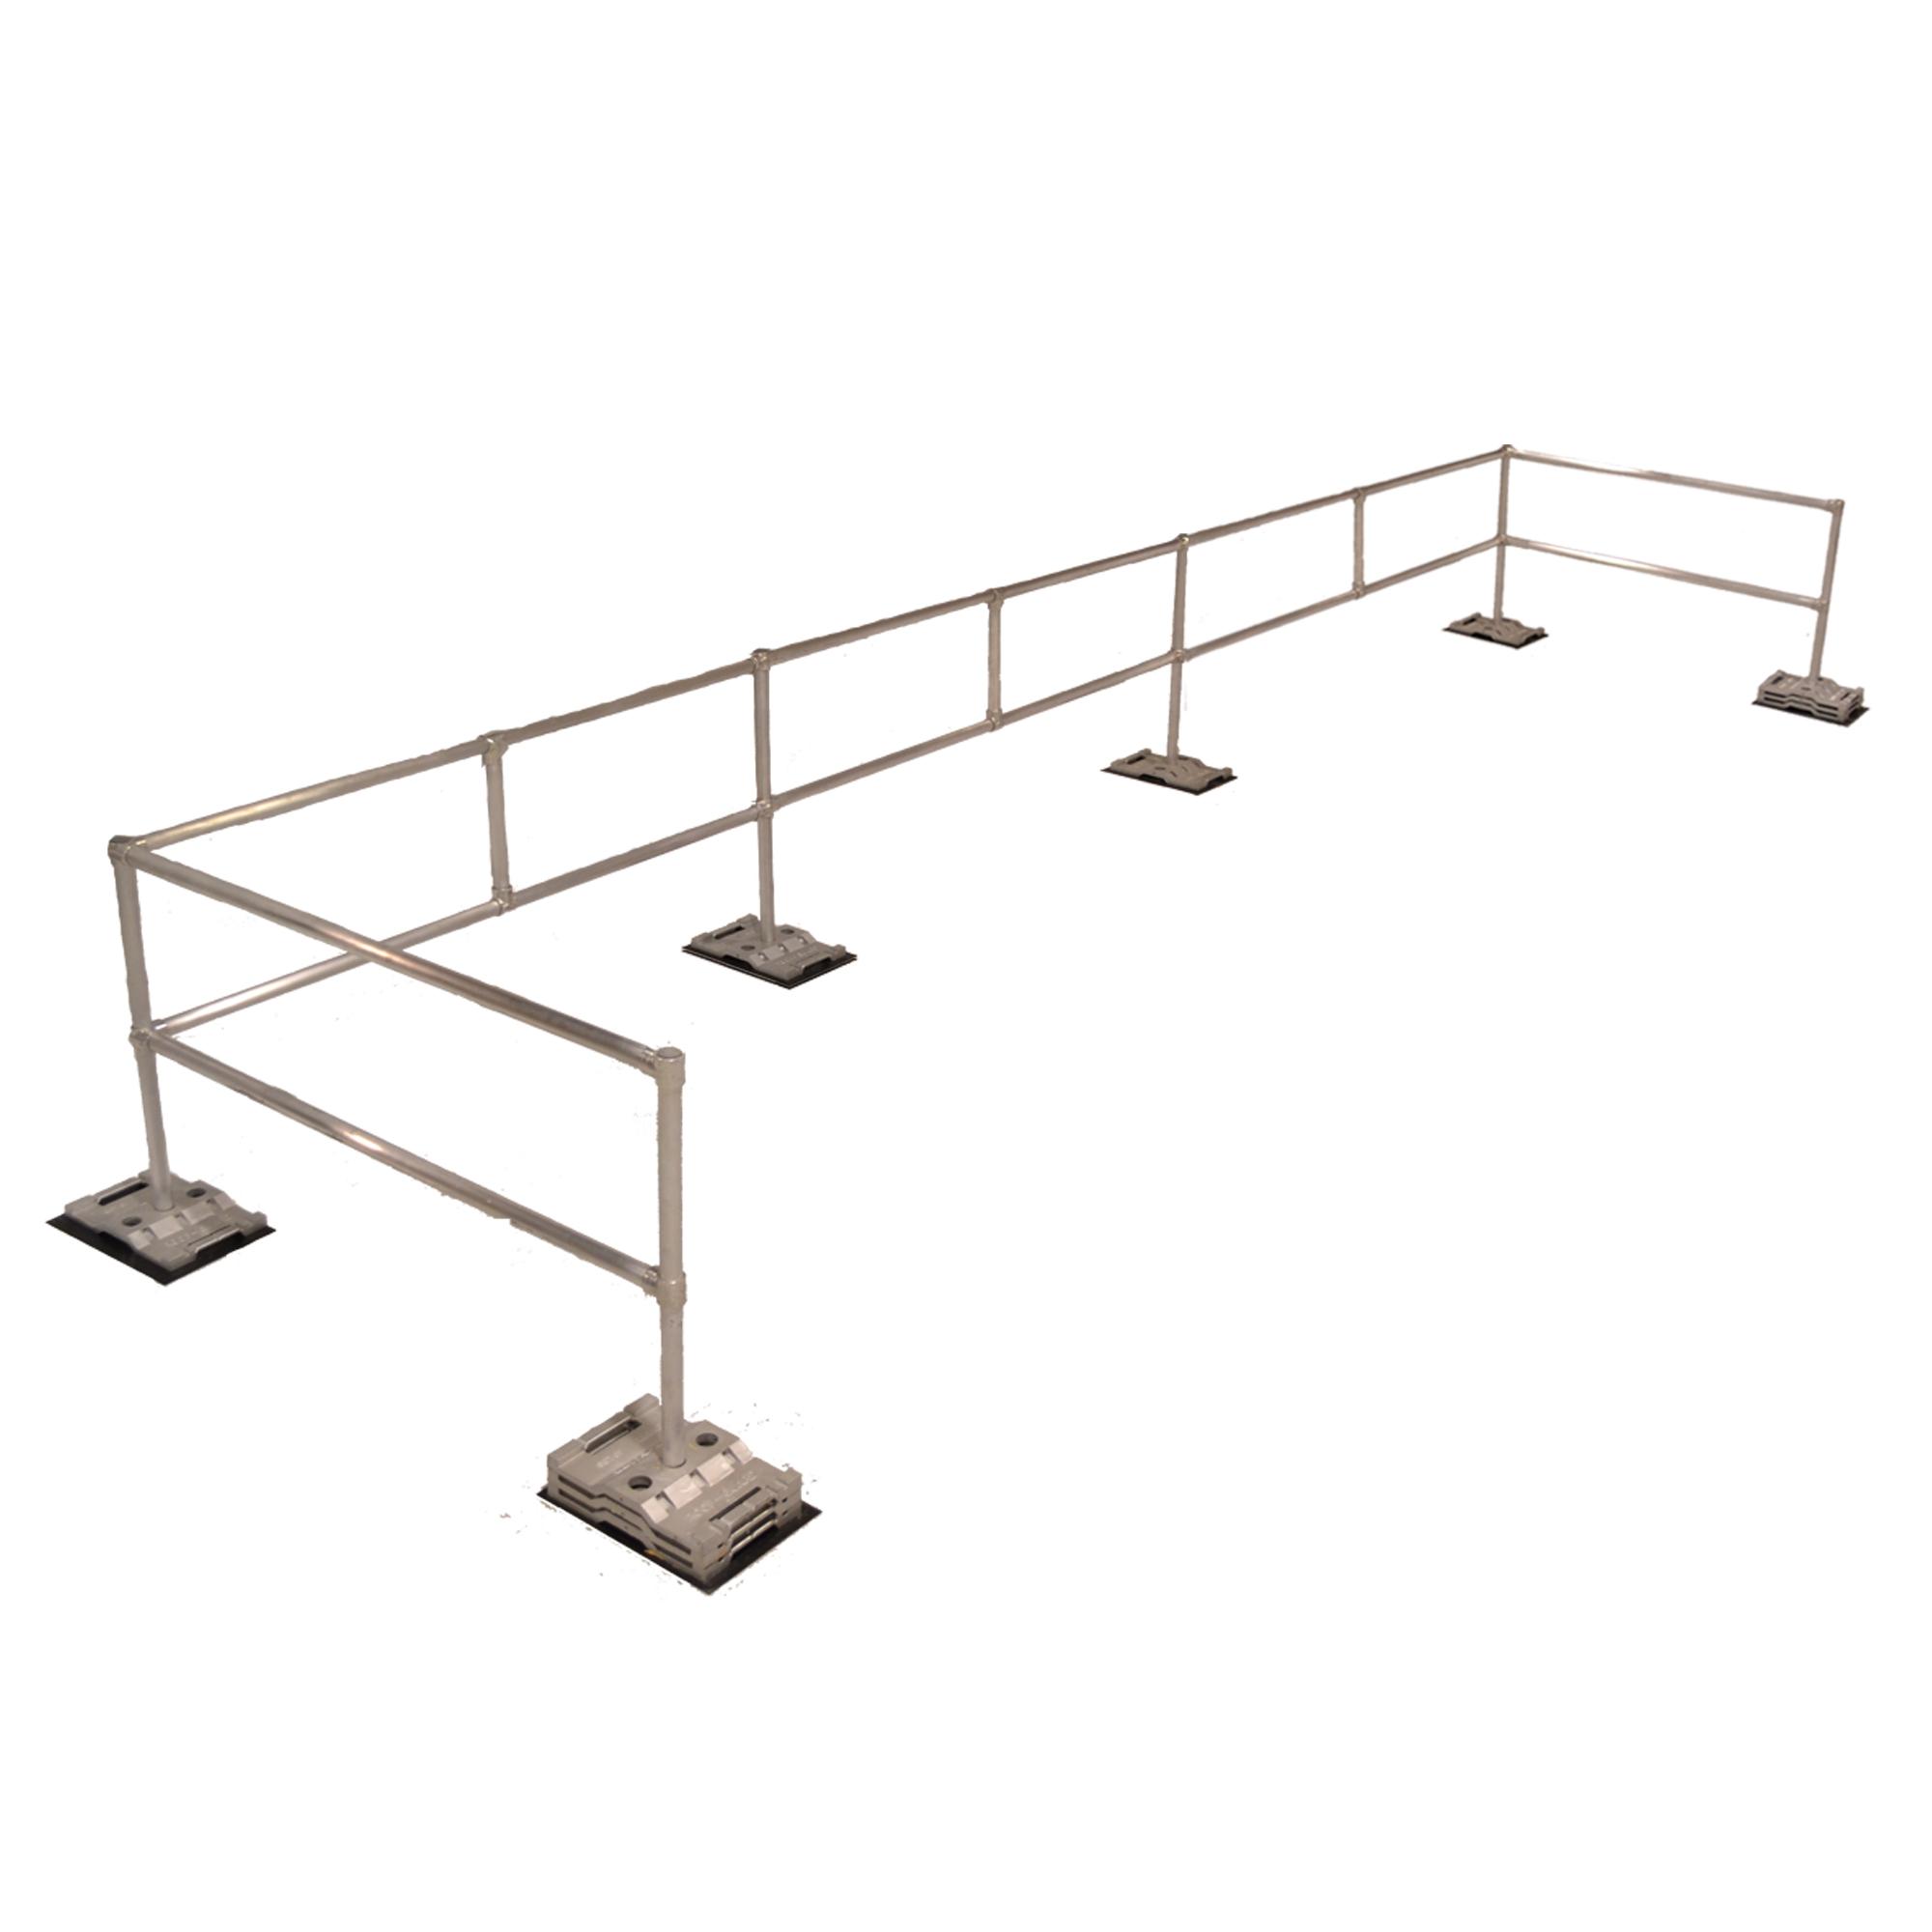 Rooftop Guard Rail Kit 27 Foot